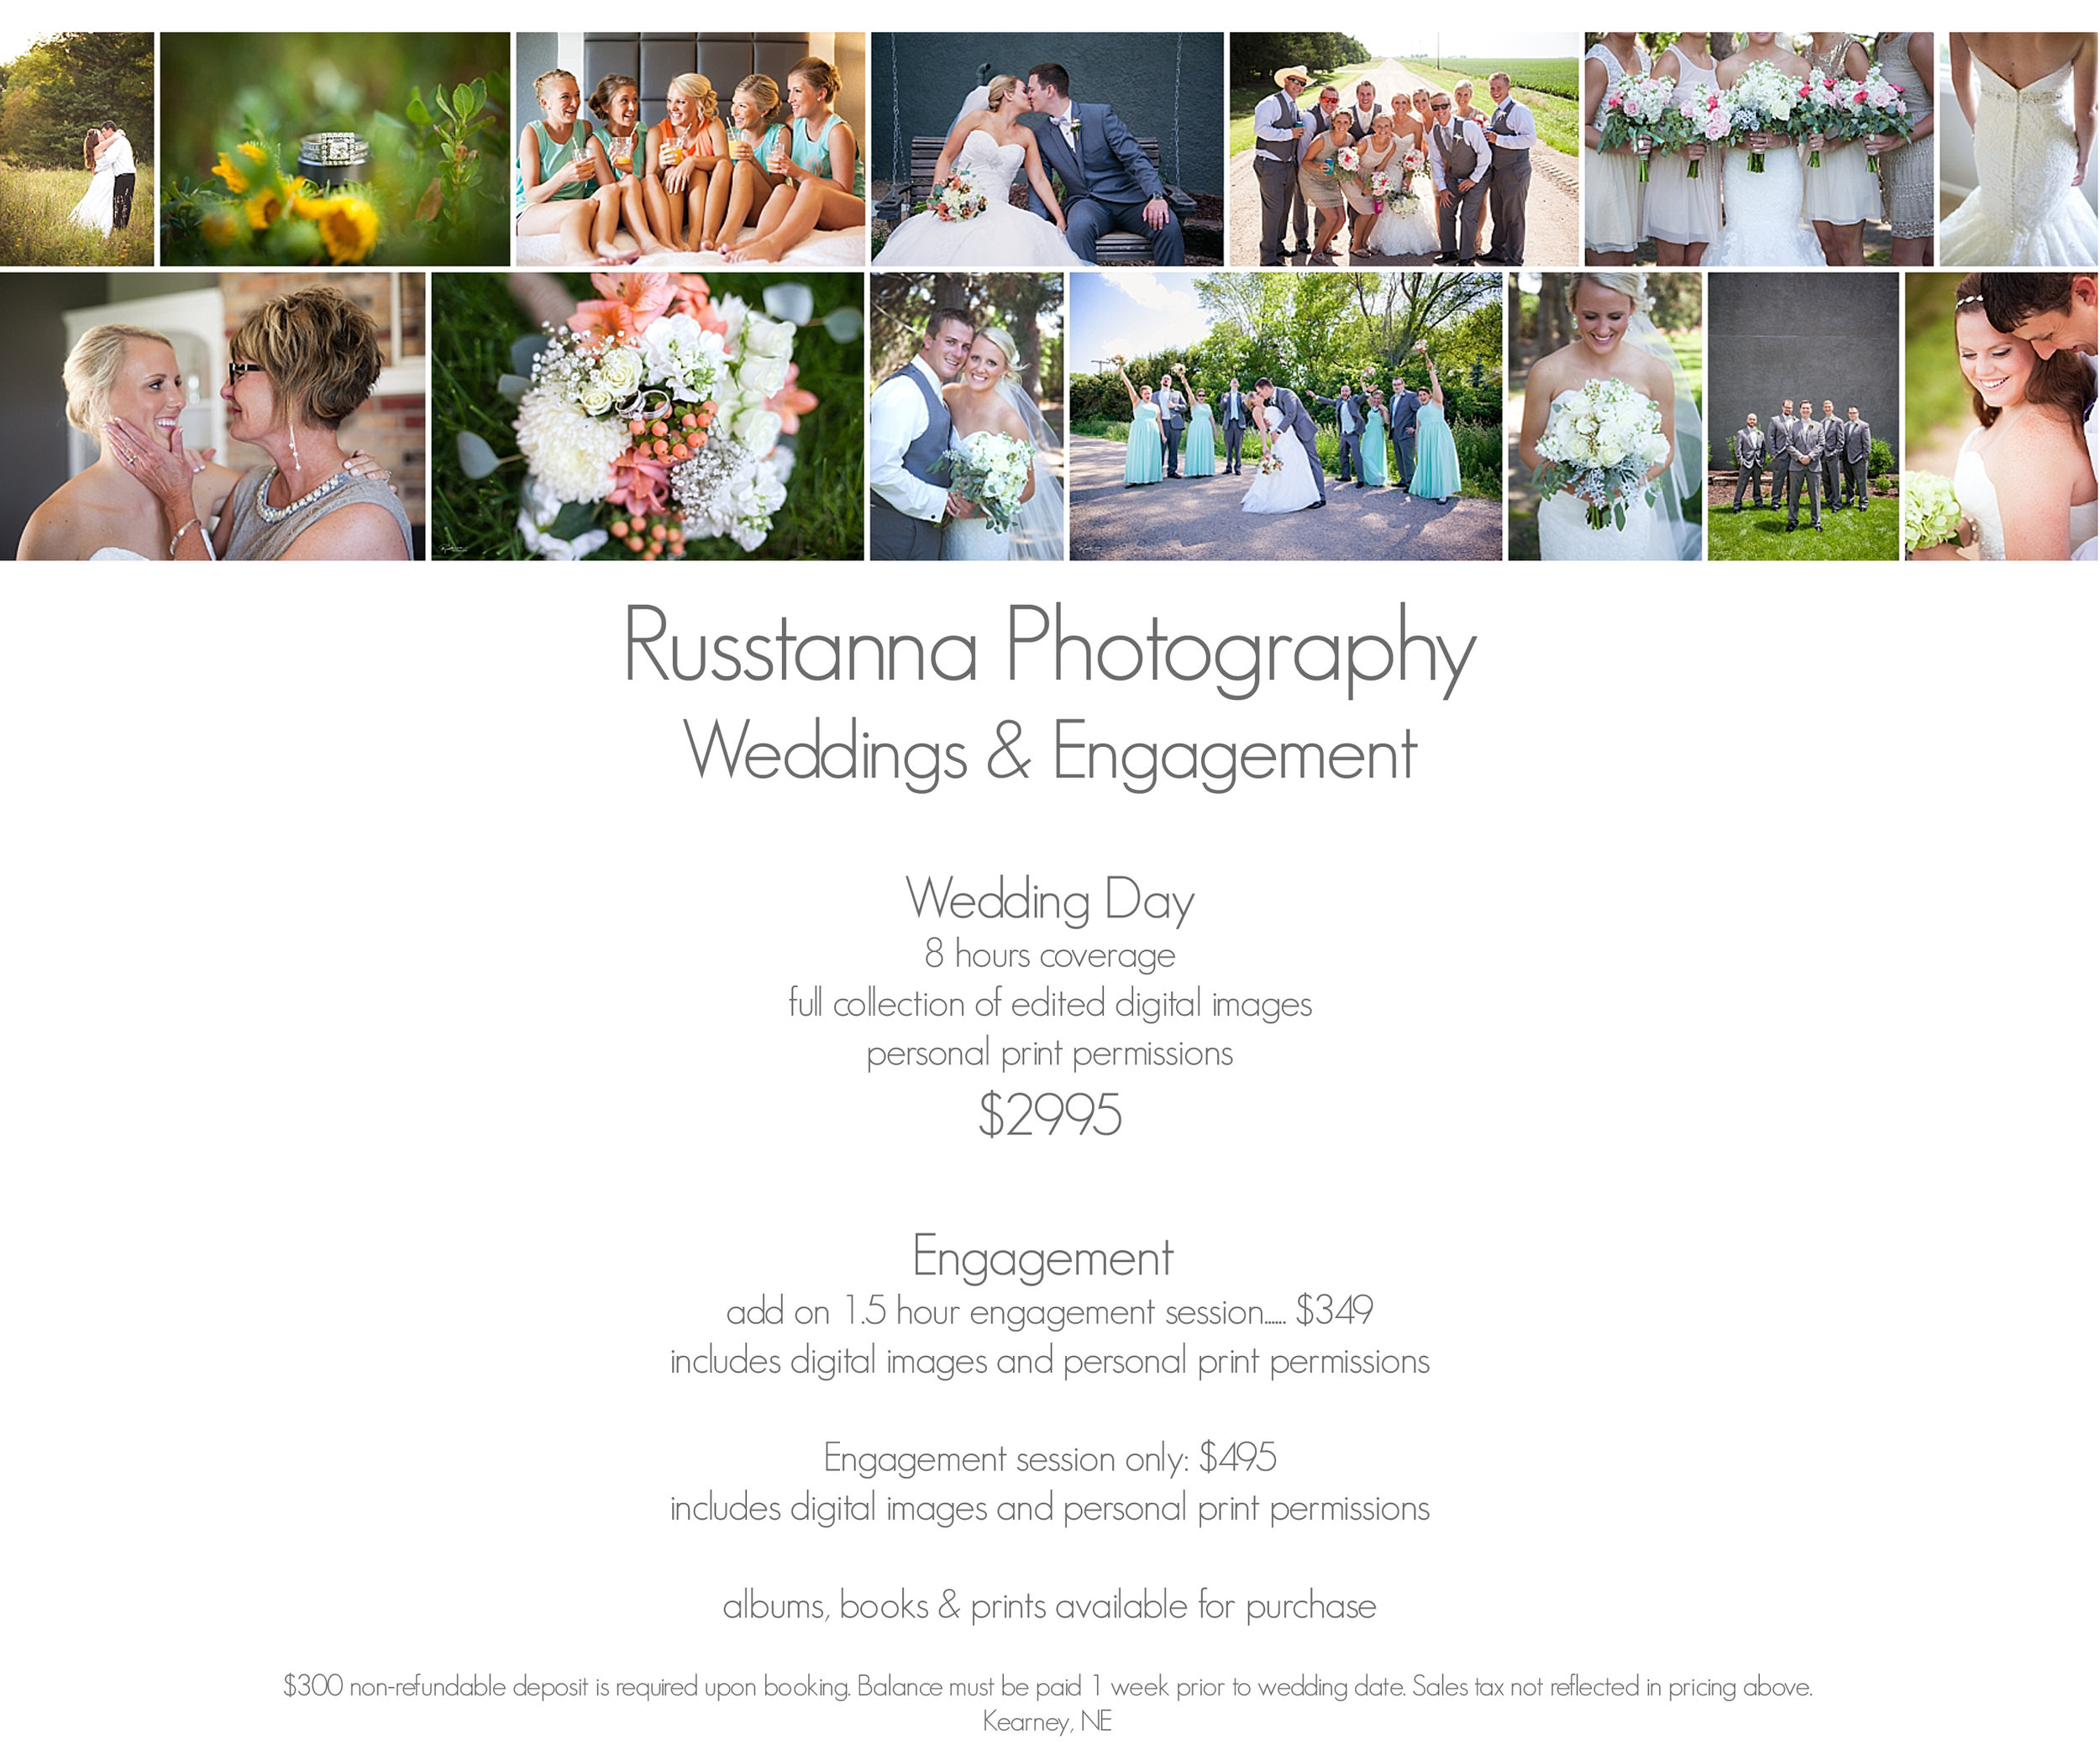 Russtanna_Photography_wedding.jpg